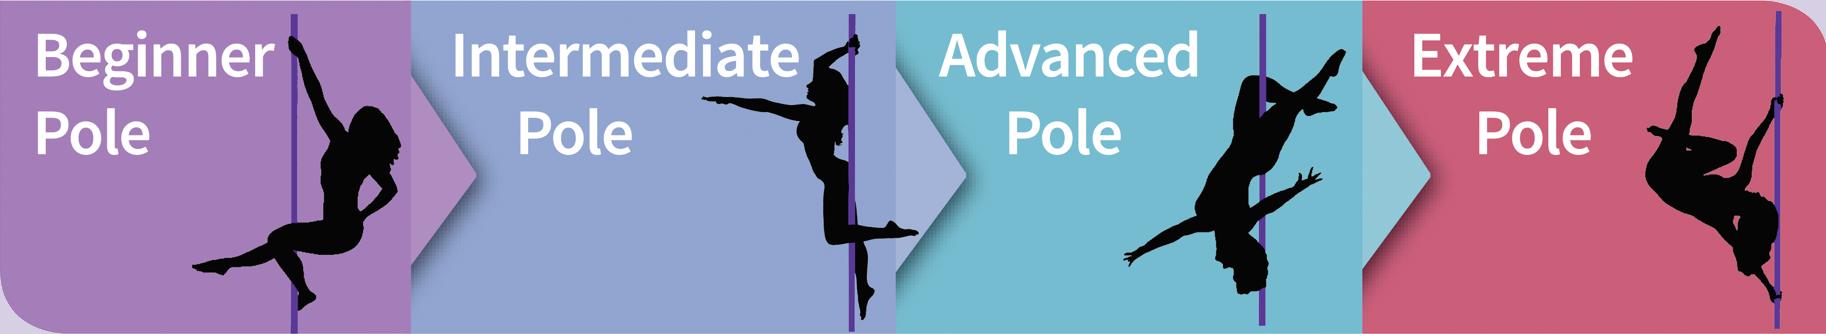 Pole Classes